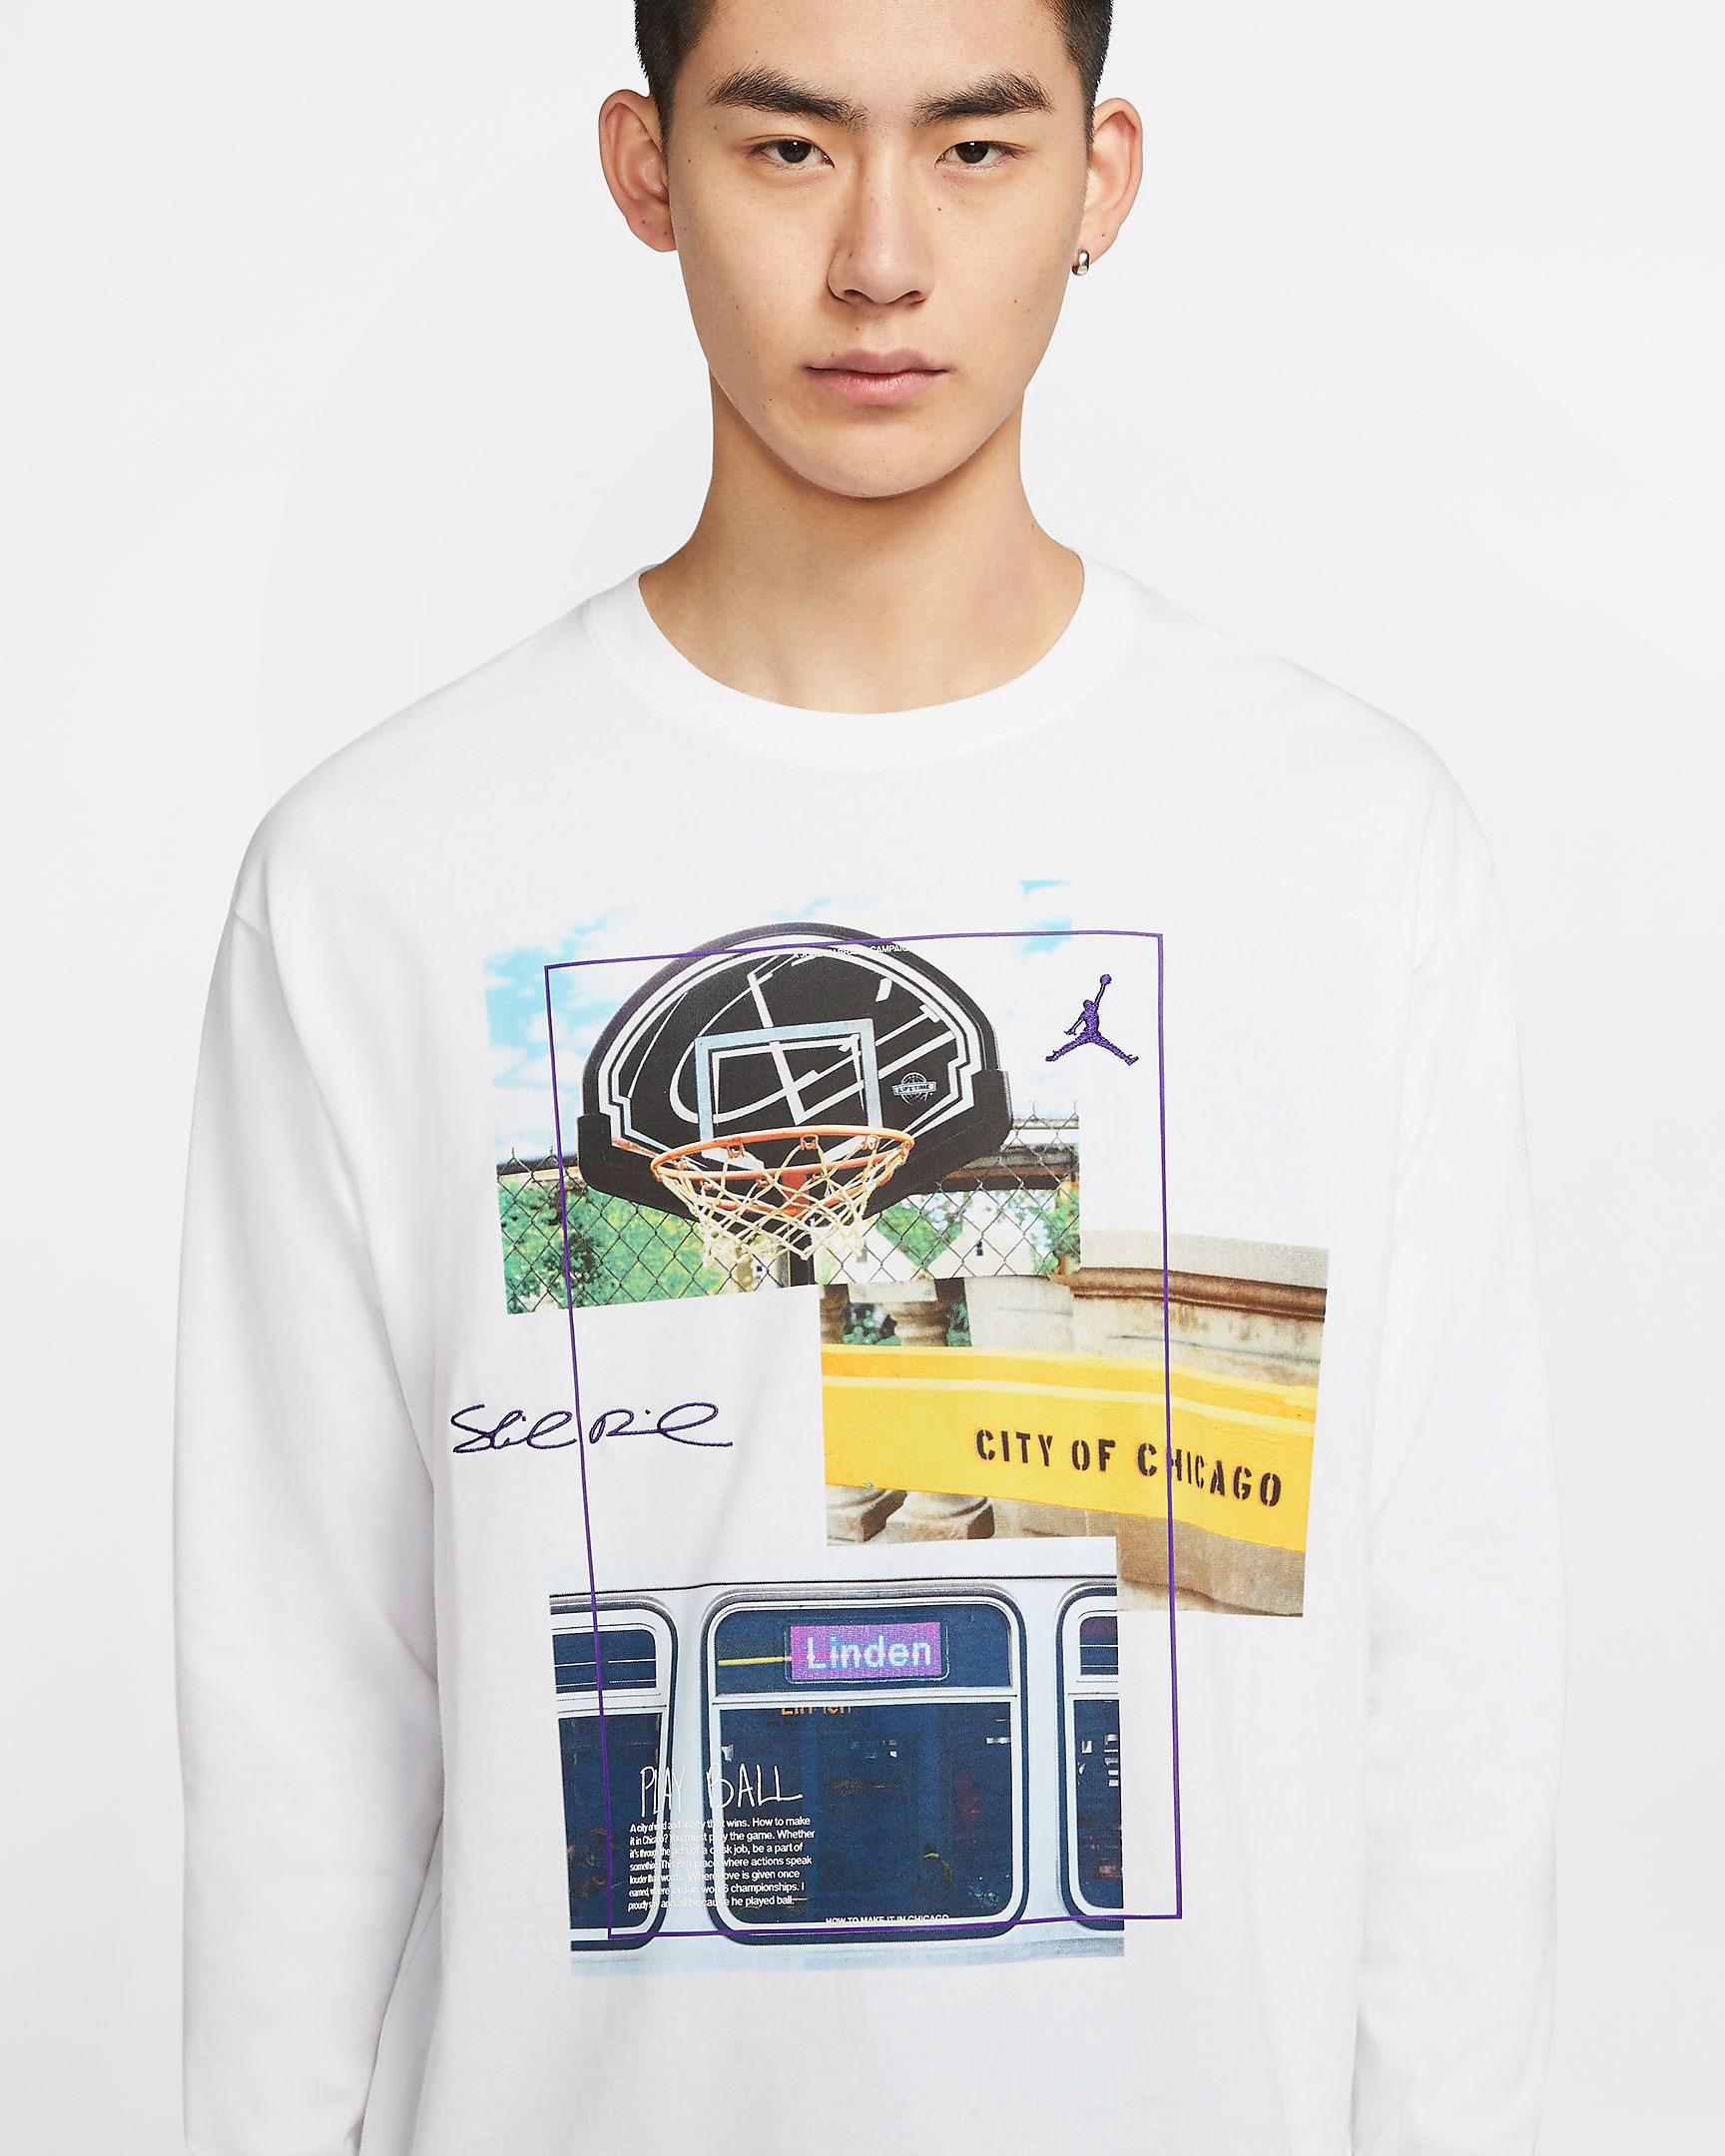 air-jordan-1-mid-sheila-rashid-shirt-2